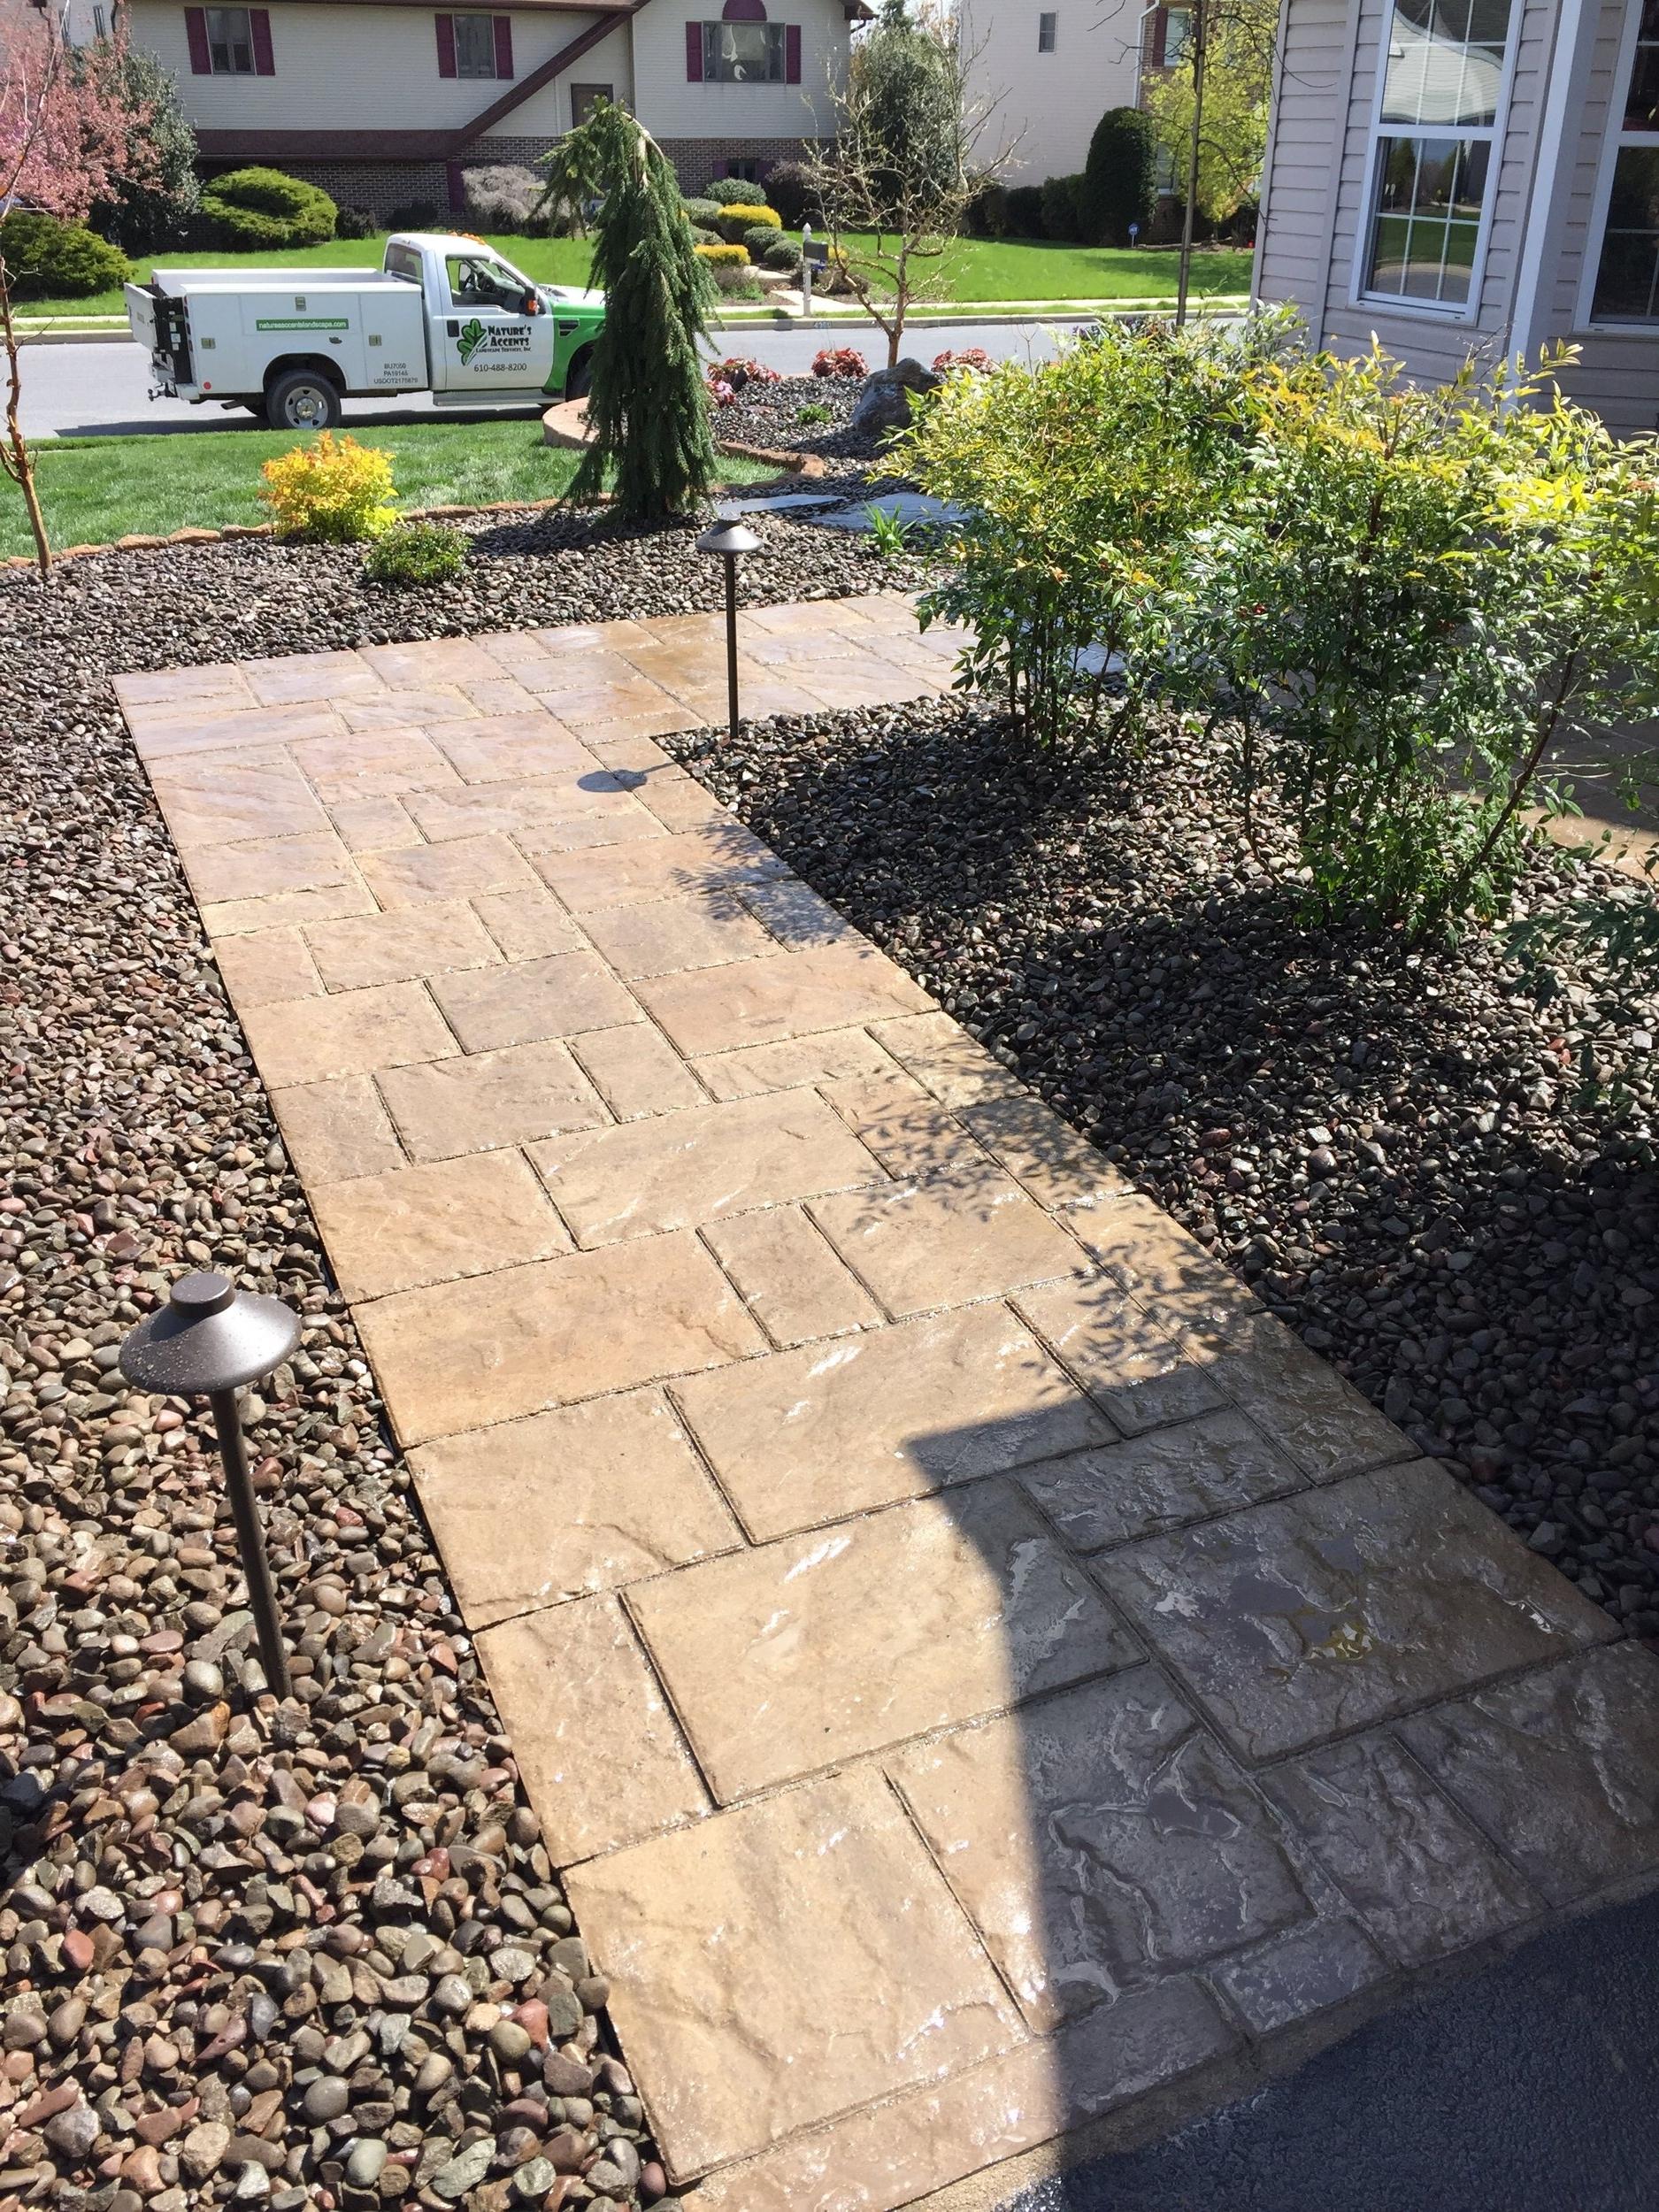 Professional landscape maintenance company in Schuylkill County, PA